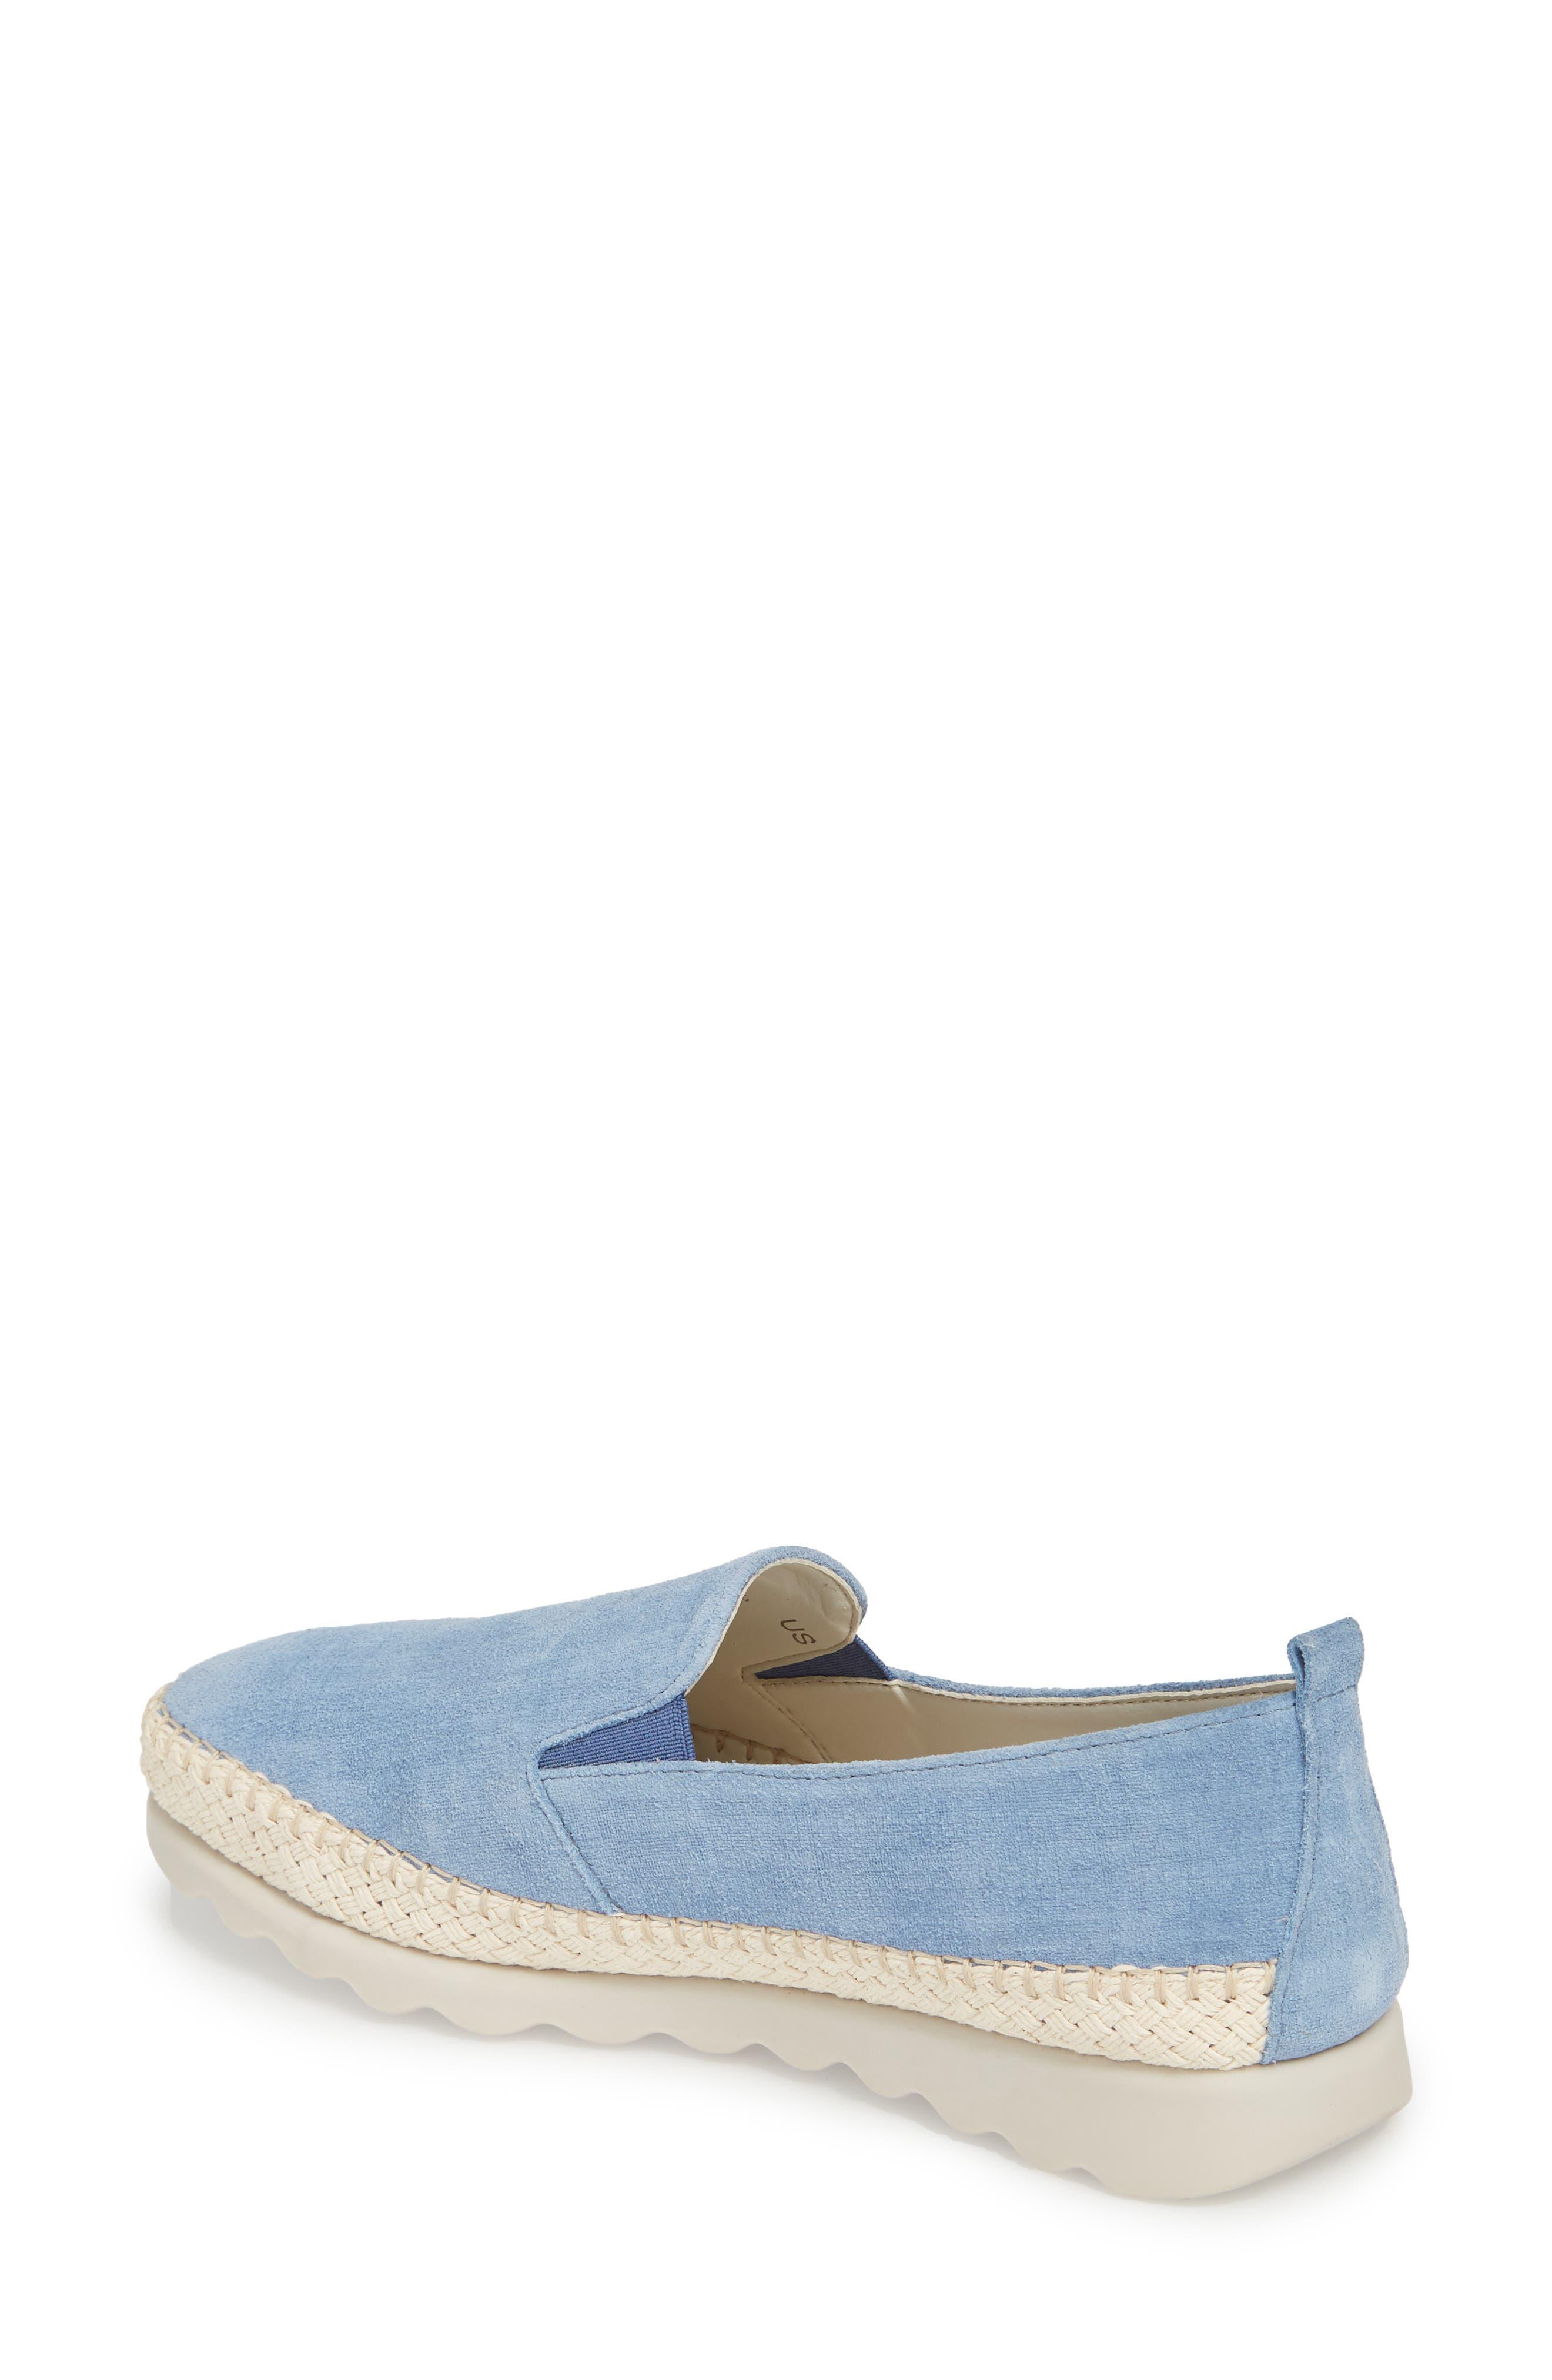 Chappie Slip-On Sneaker,                             Alternate thumbnail 2, color,                             DENIM PRINTED SUEDE